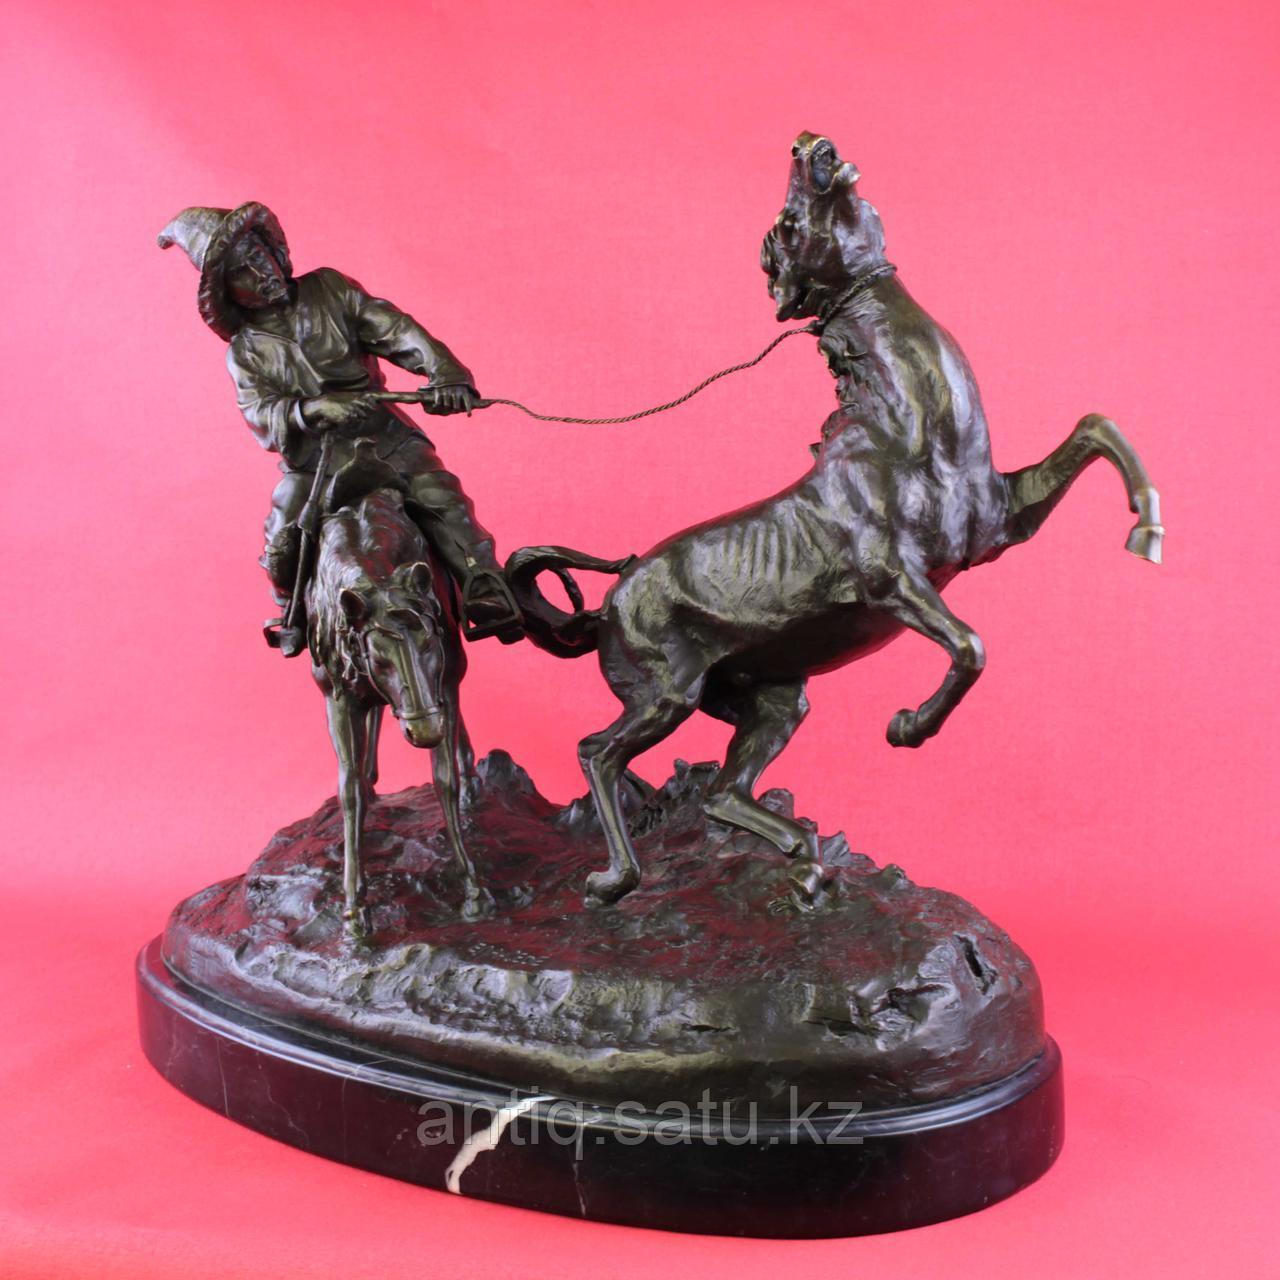 Скульптурная композиция «Ловля дикой лошади» По модели Е.А. Лансере (1848-1886) - фото 2